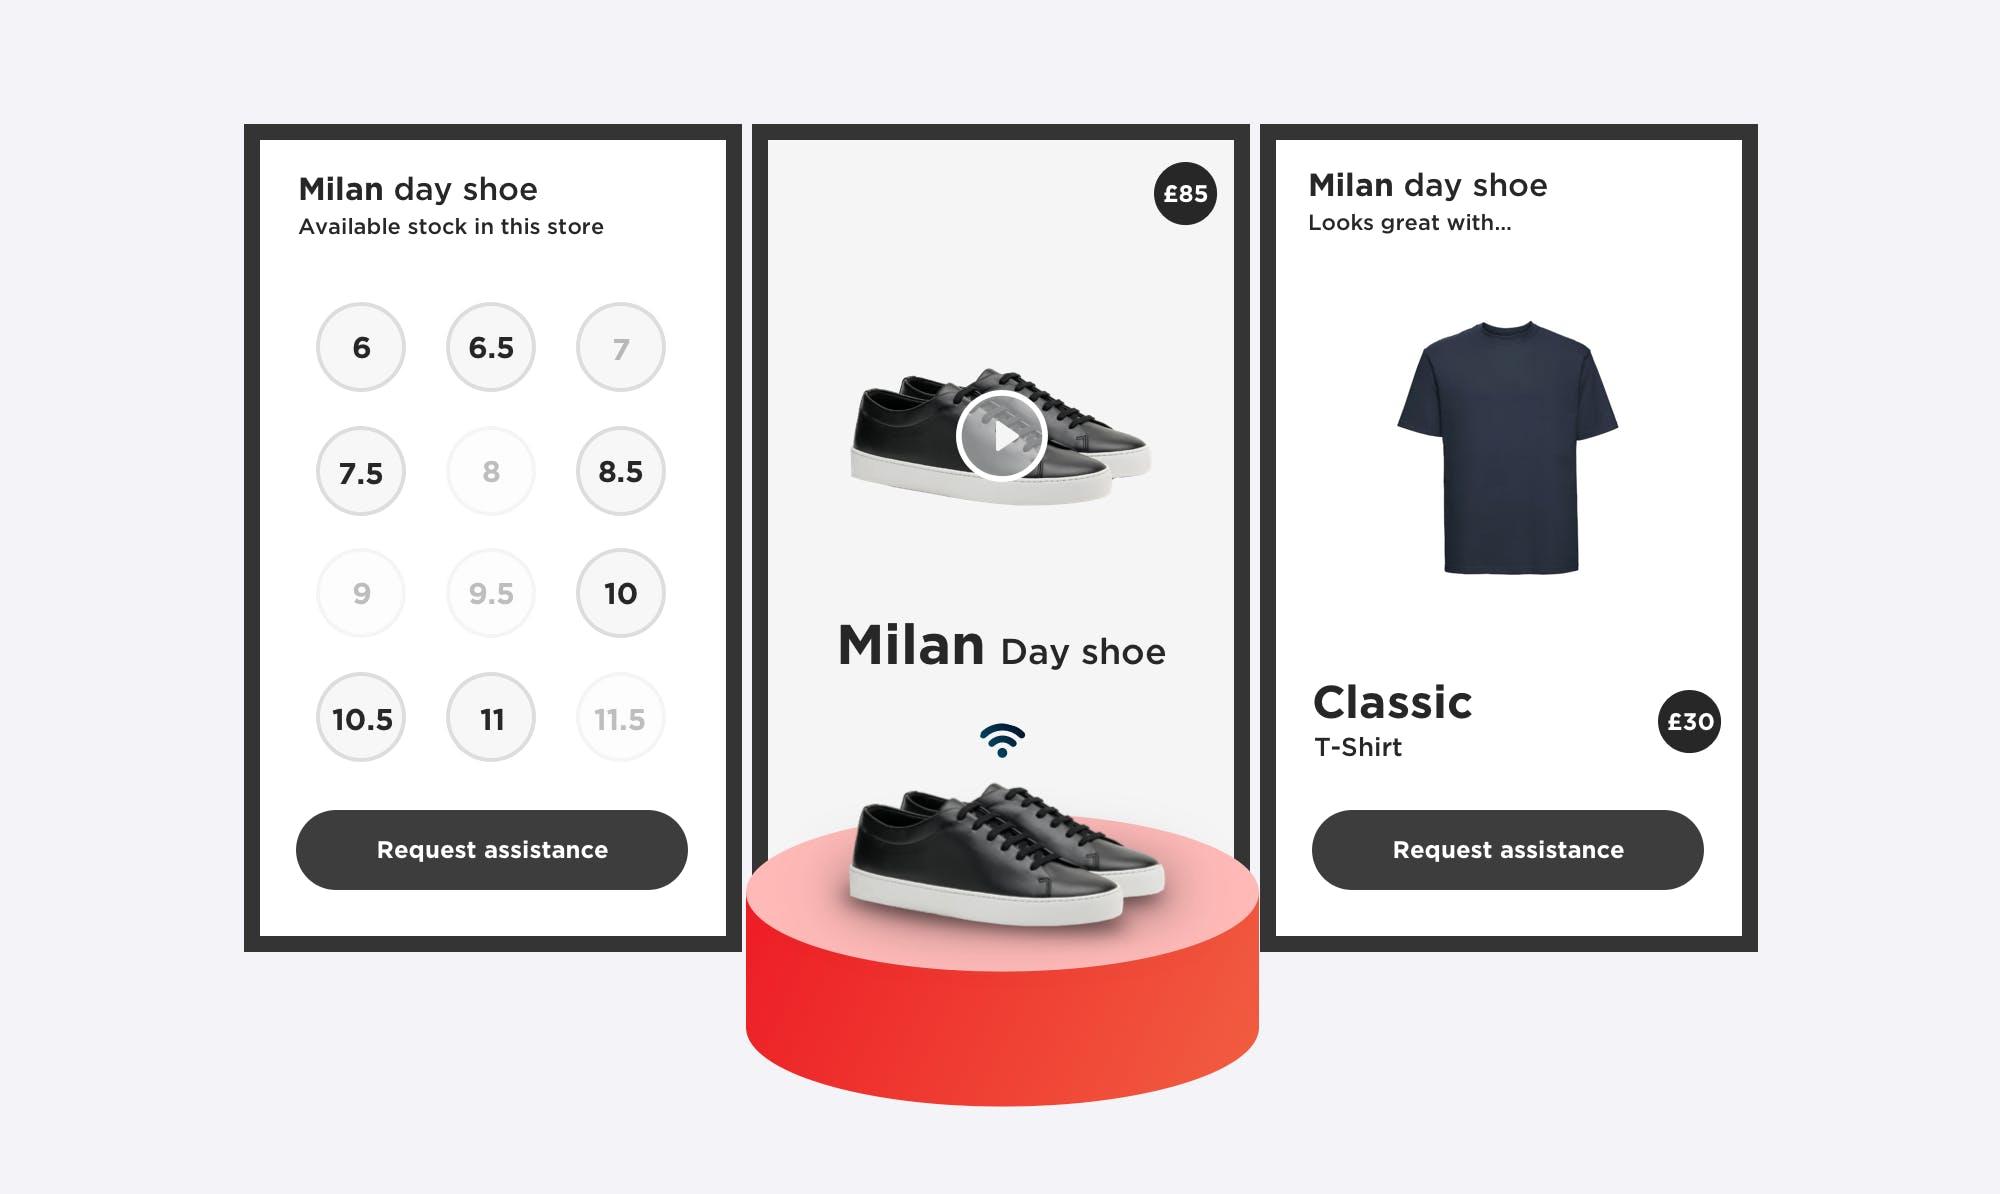 RetailOS dynamic displays